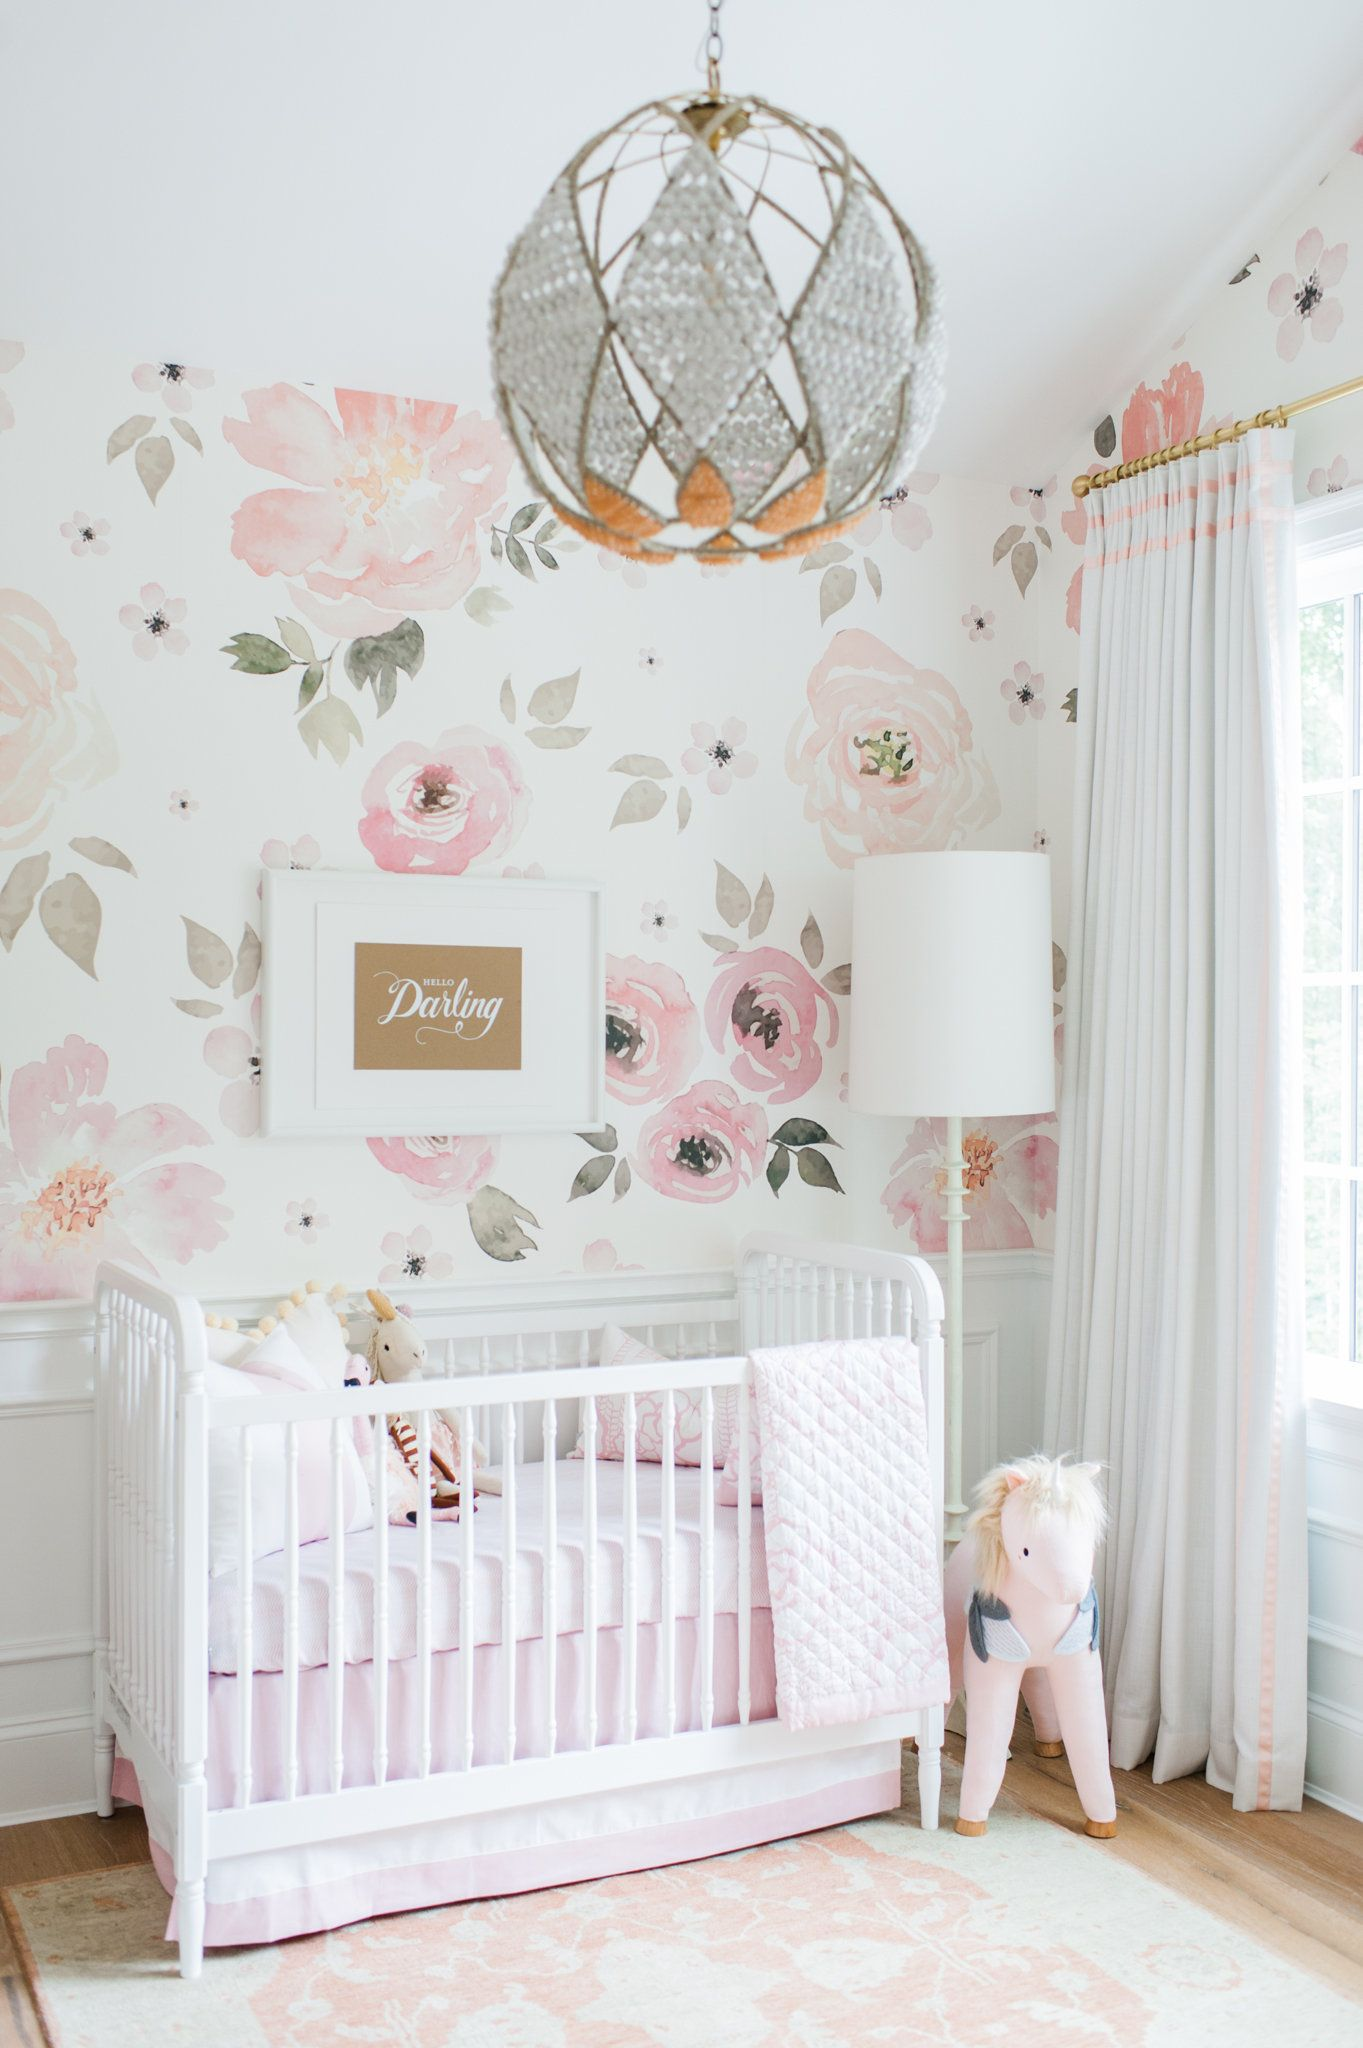 Lillya s Nursery & Giveaway